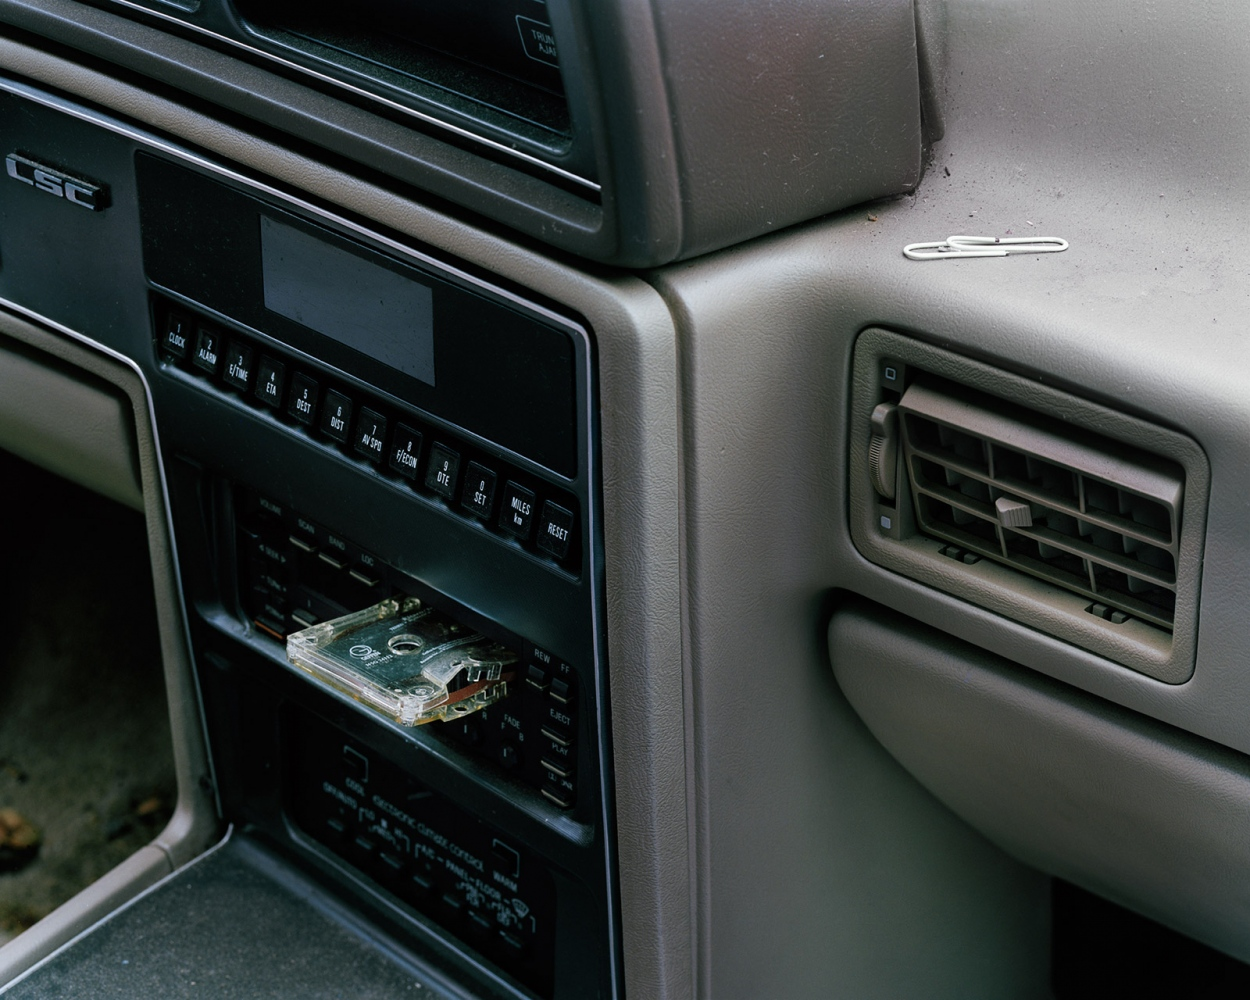 Cassette Tape, CT 2008